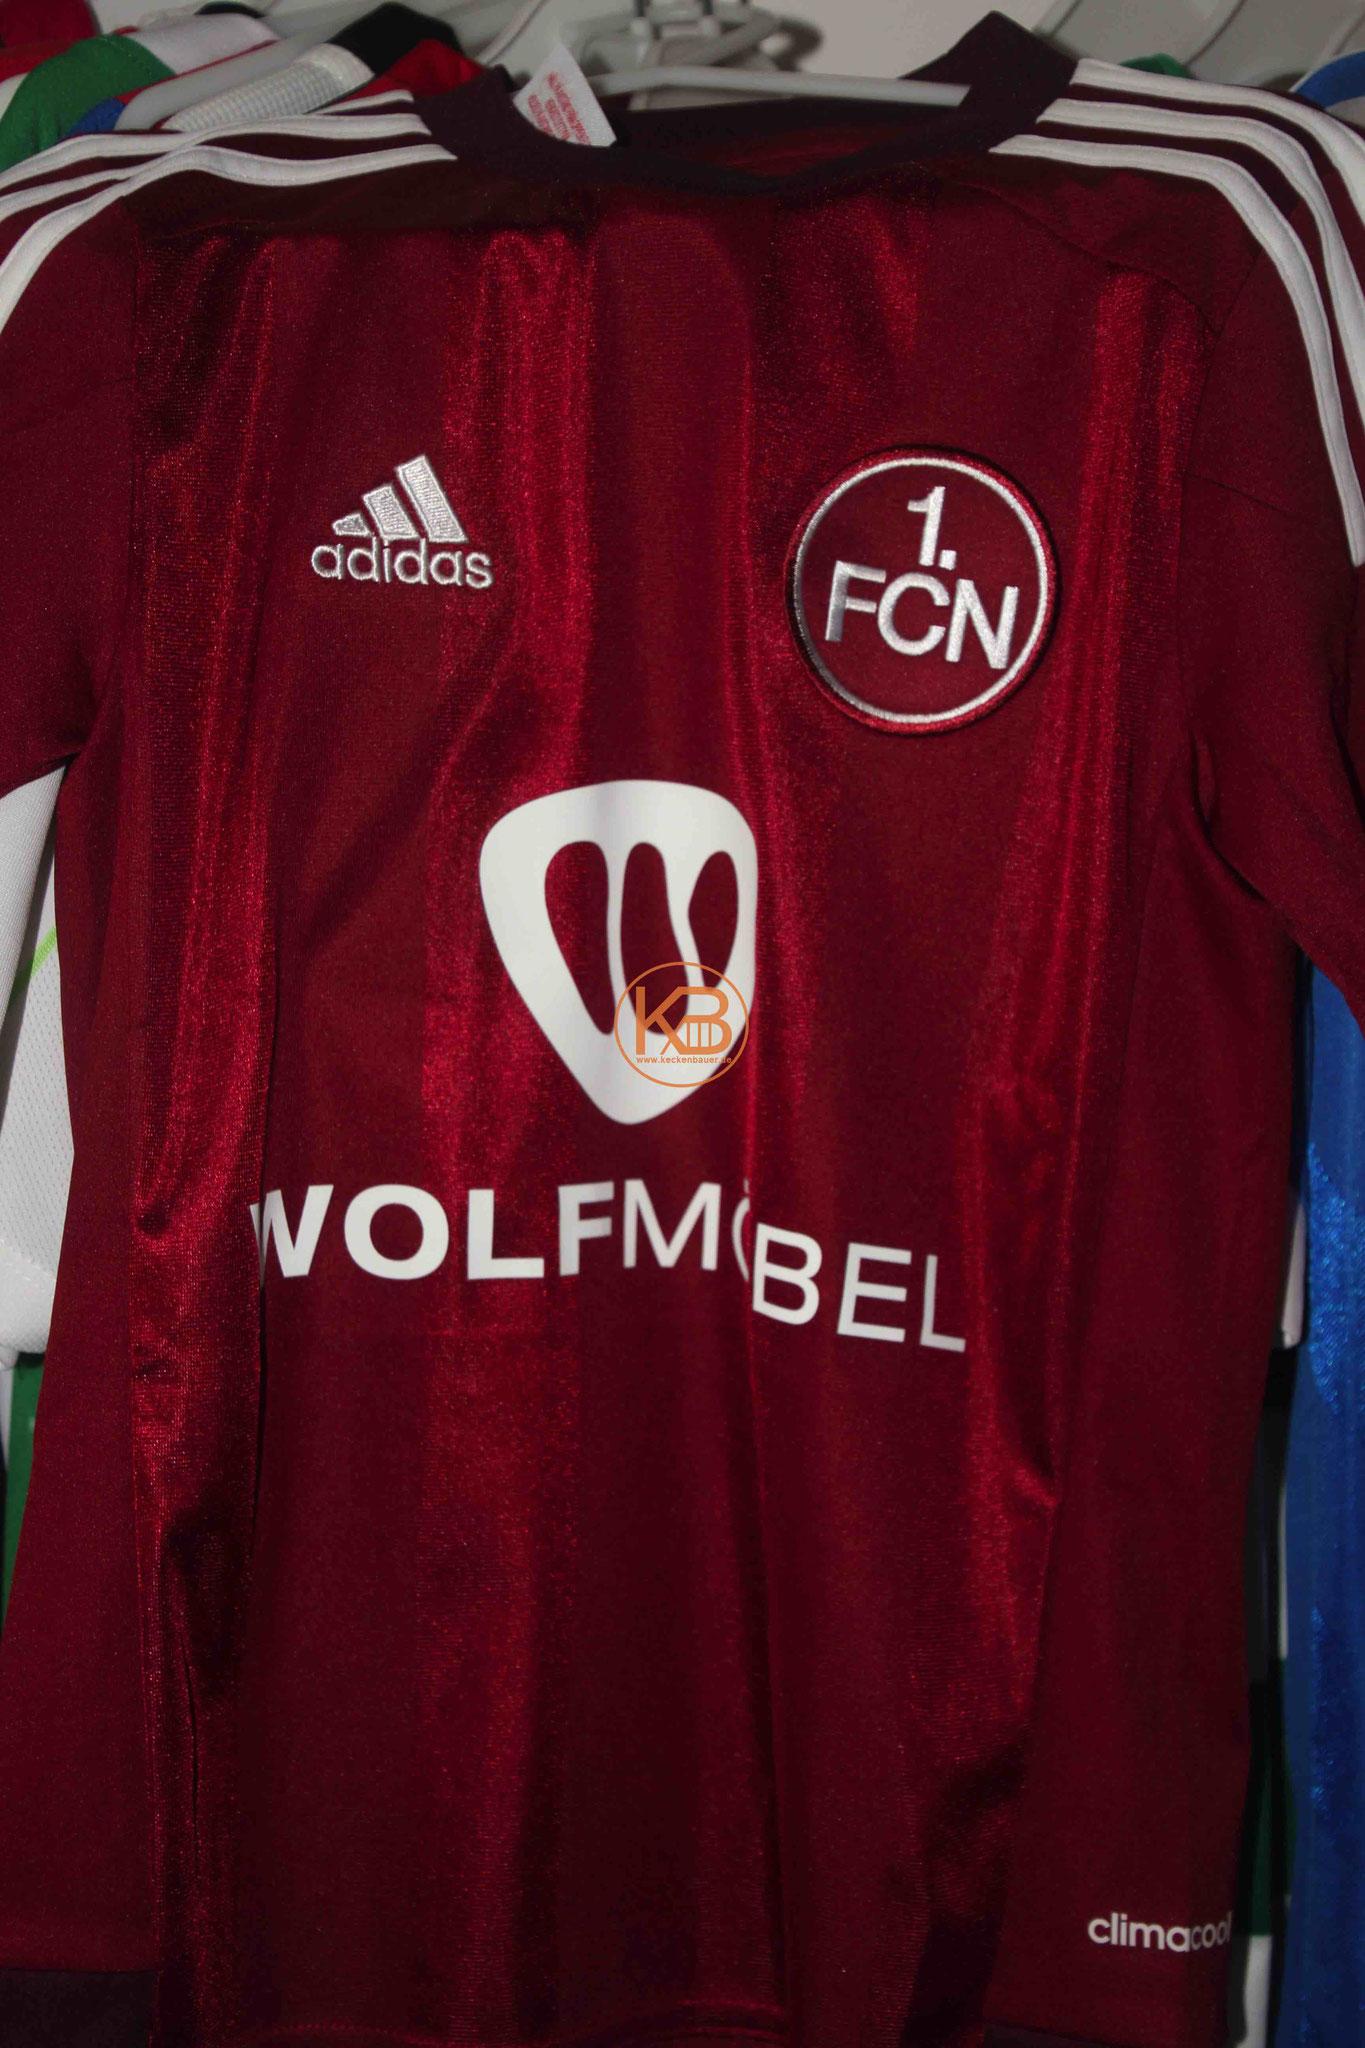 Adidas Trikot vom 1. FC Nürnberg